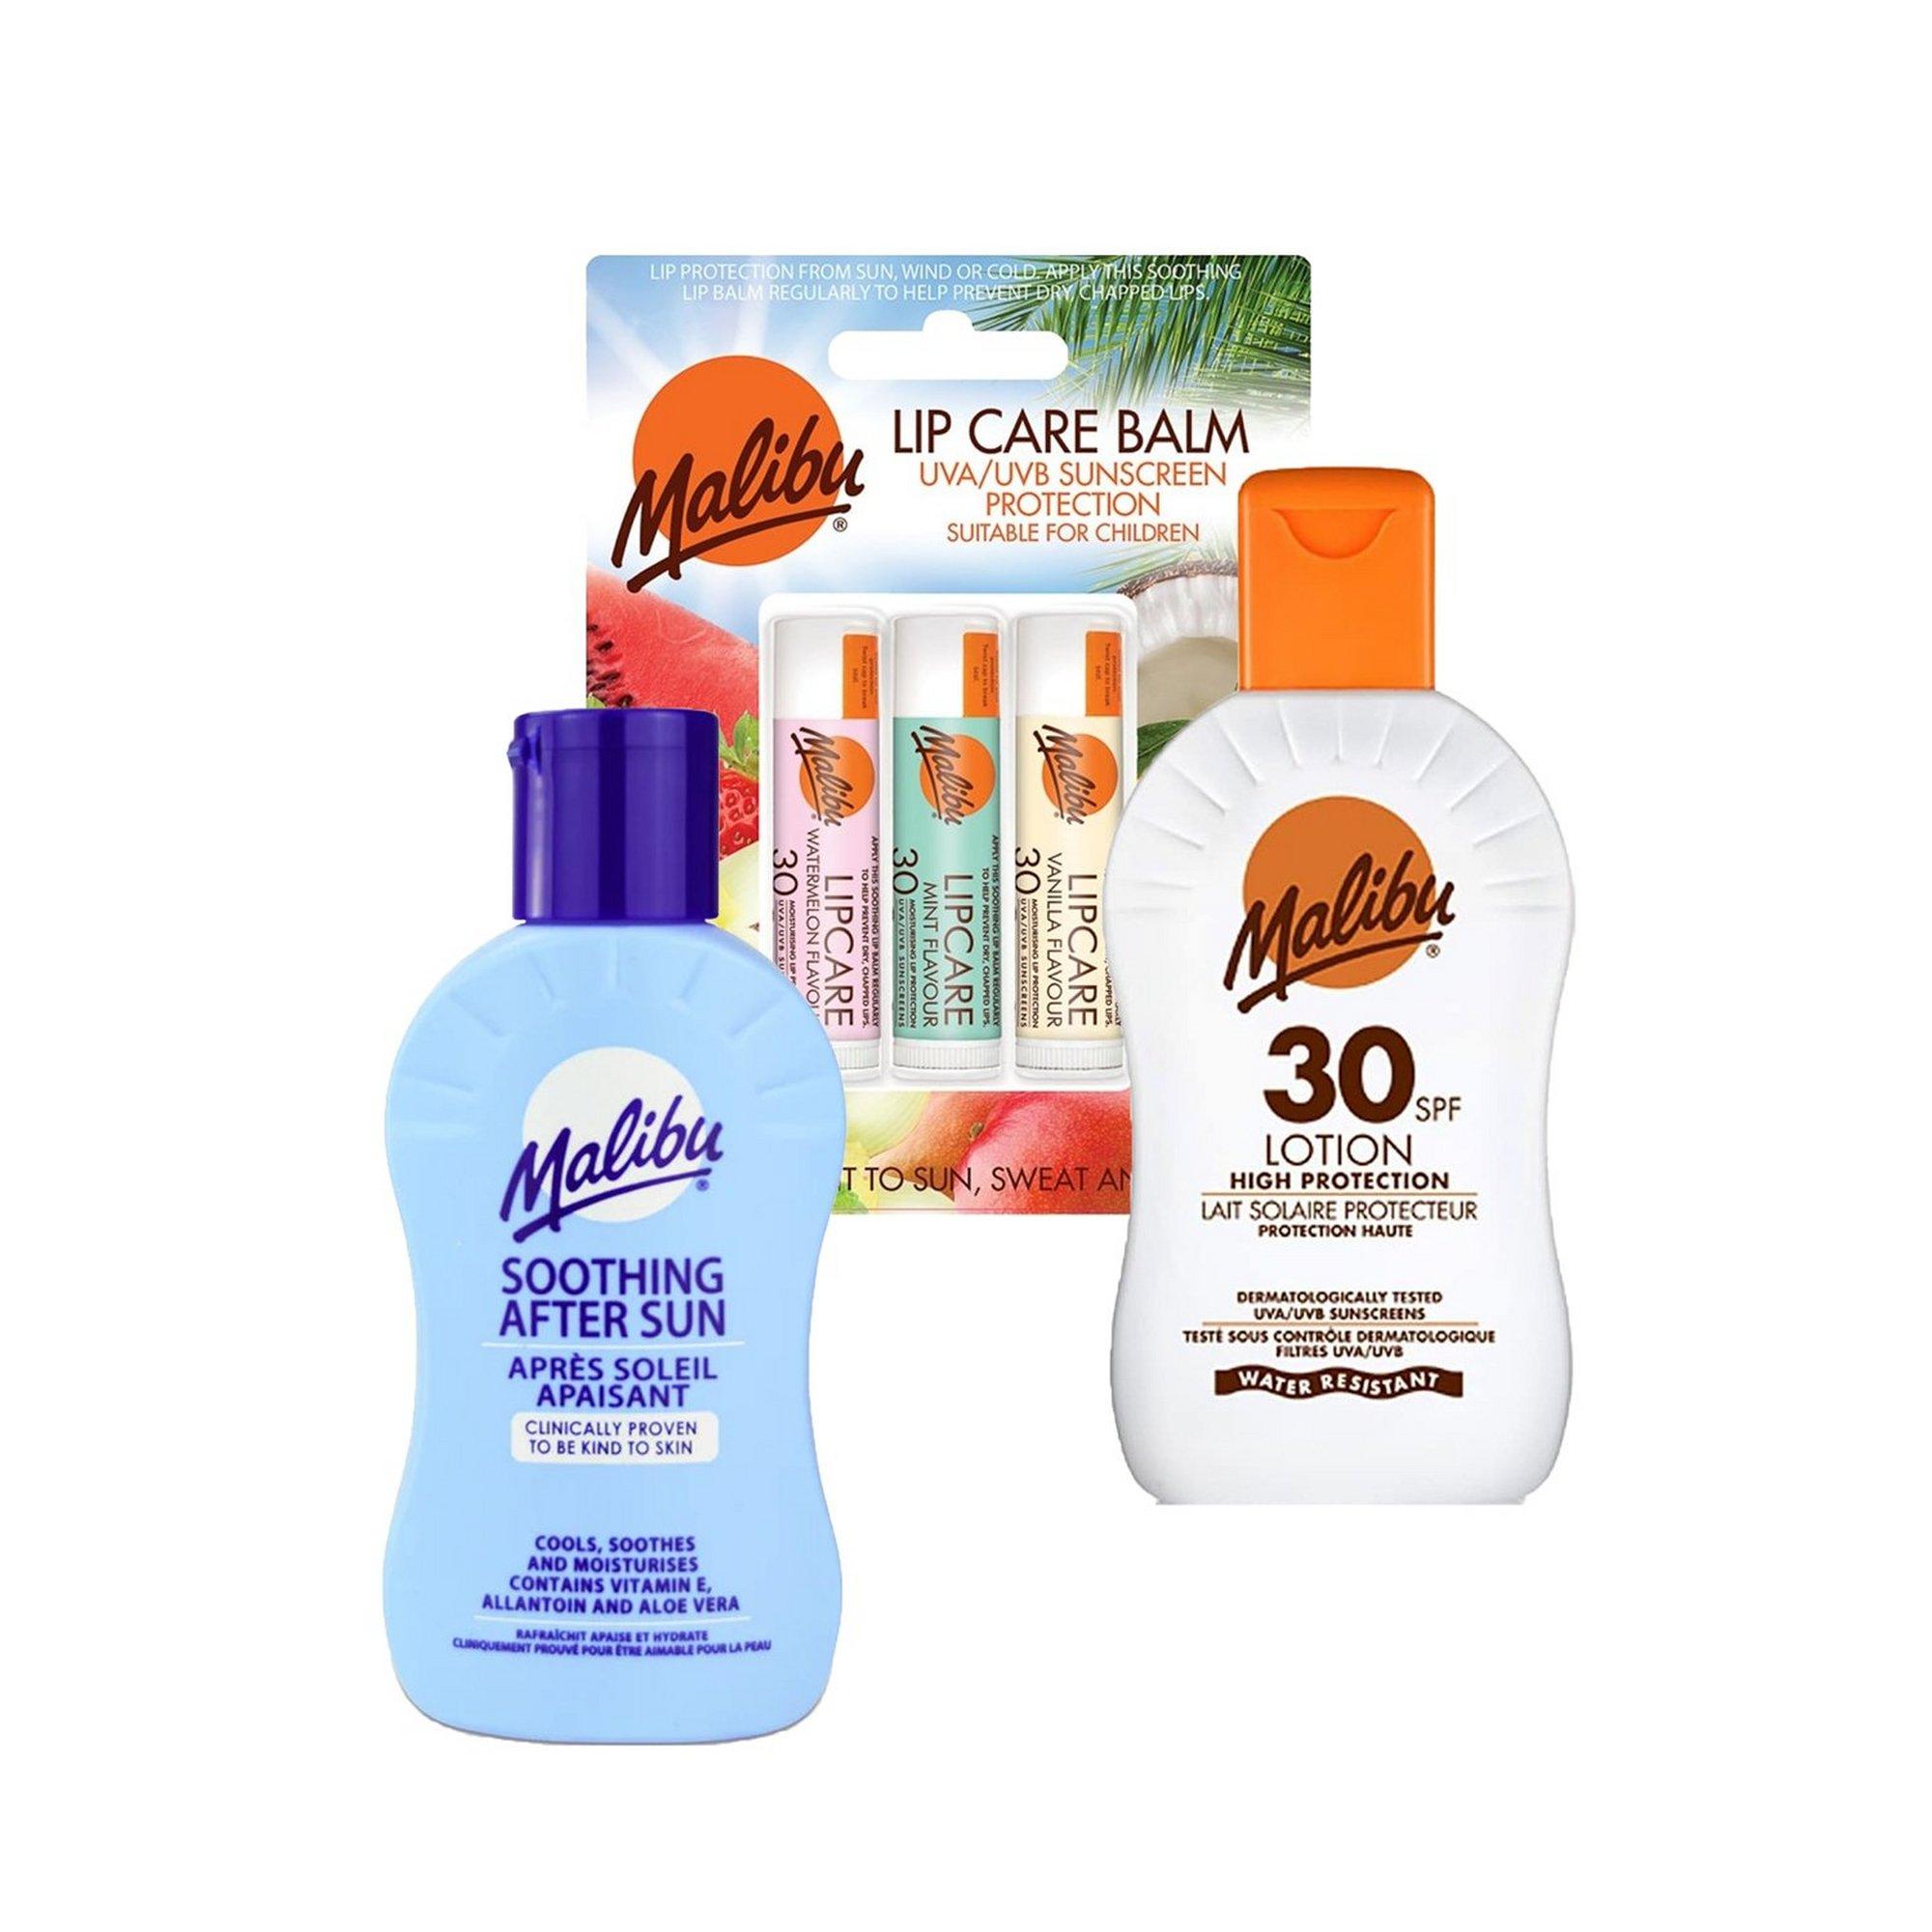 Image of Malibu Weekend Suncare Pack